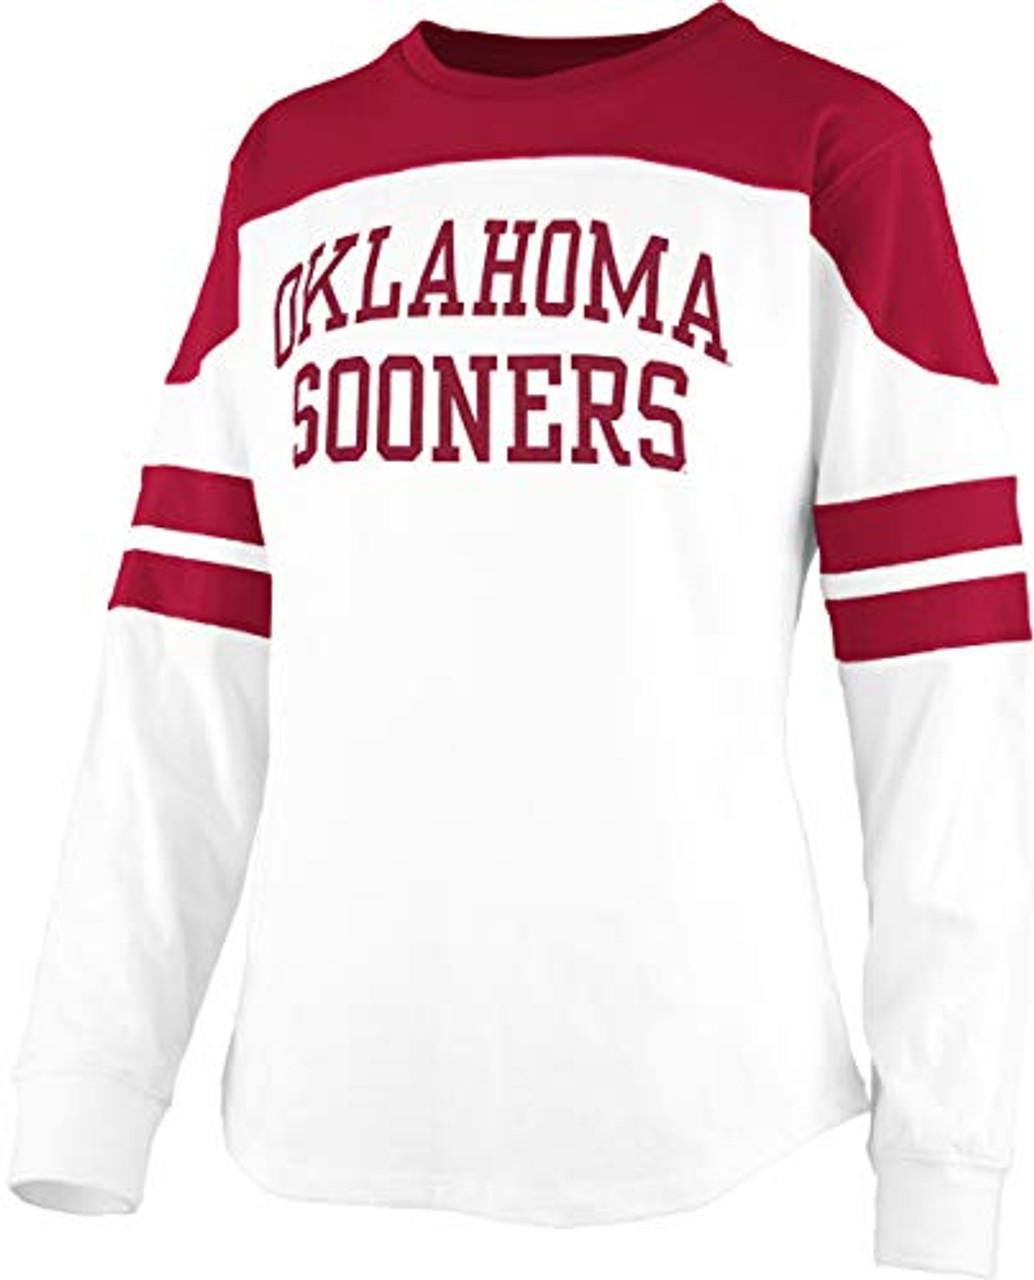 university of oklahoma shirts